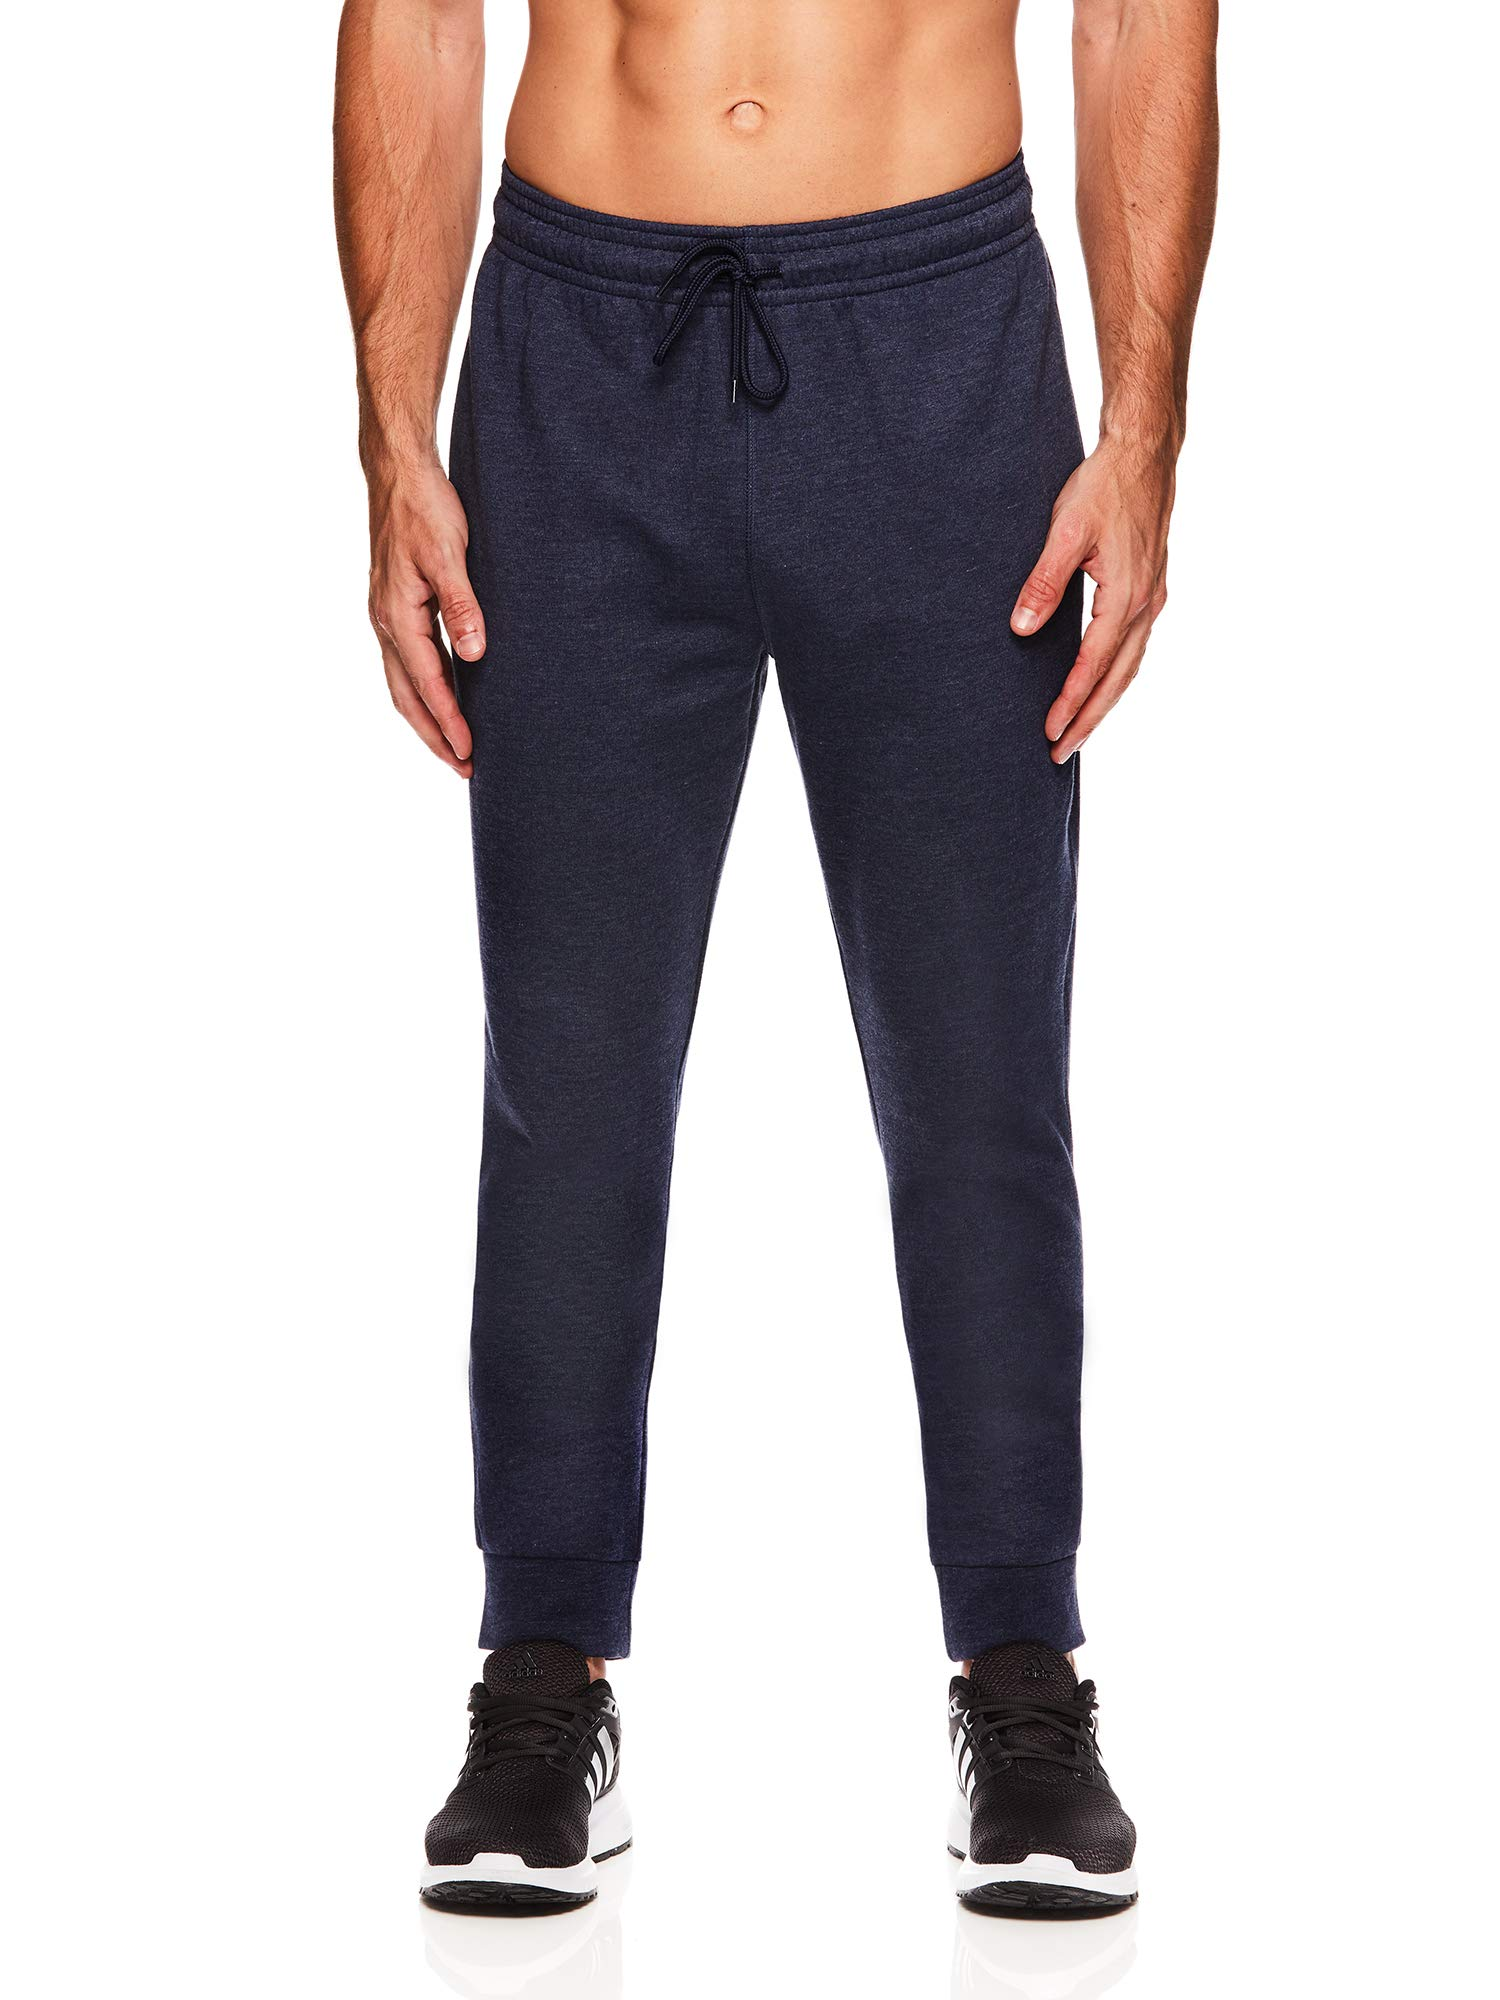 HEAD Men's Jogger Activewear Pants - Performance Workout & Running Sweatpants - Ultra Navy Heather, Small